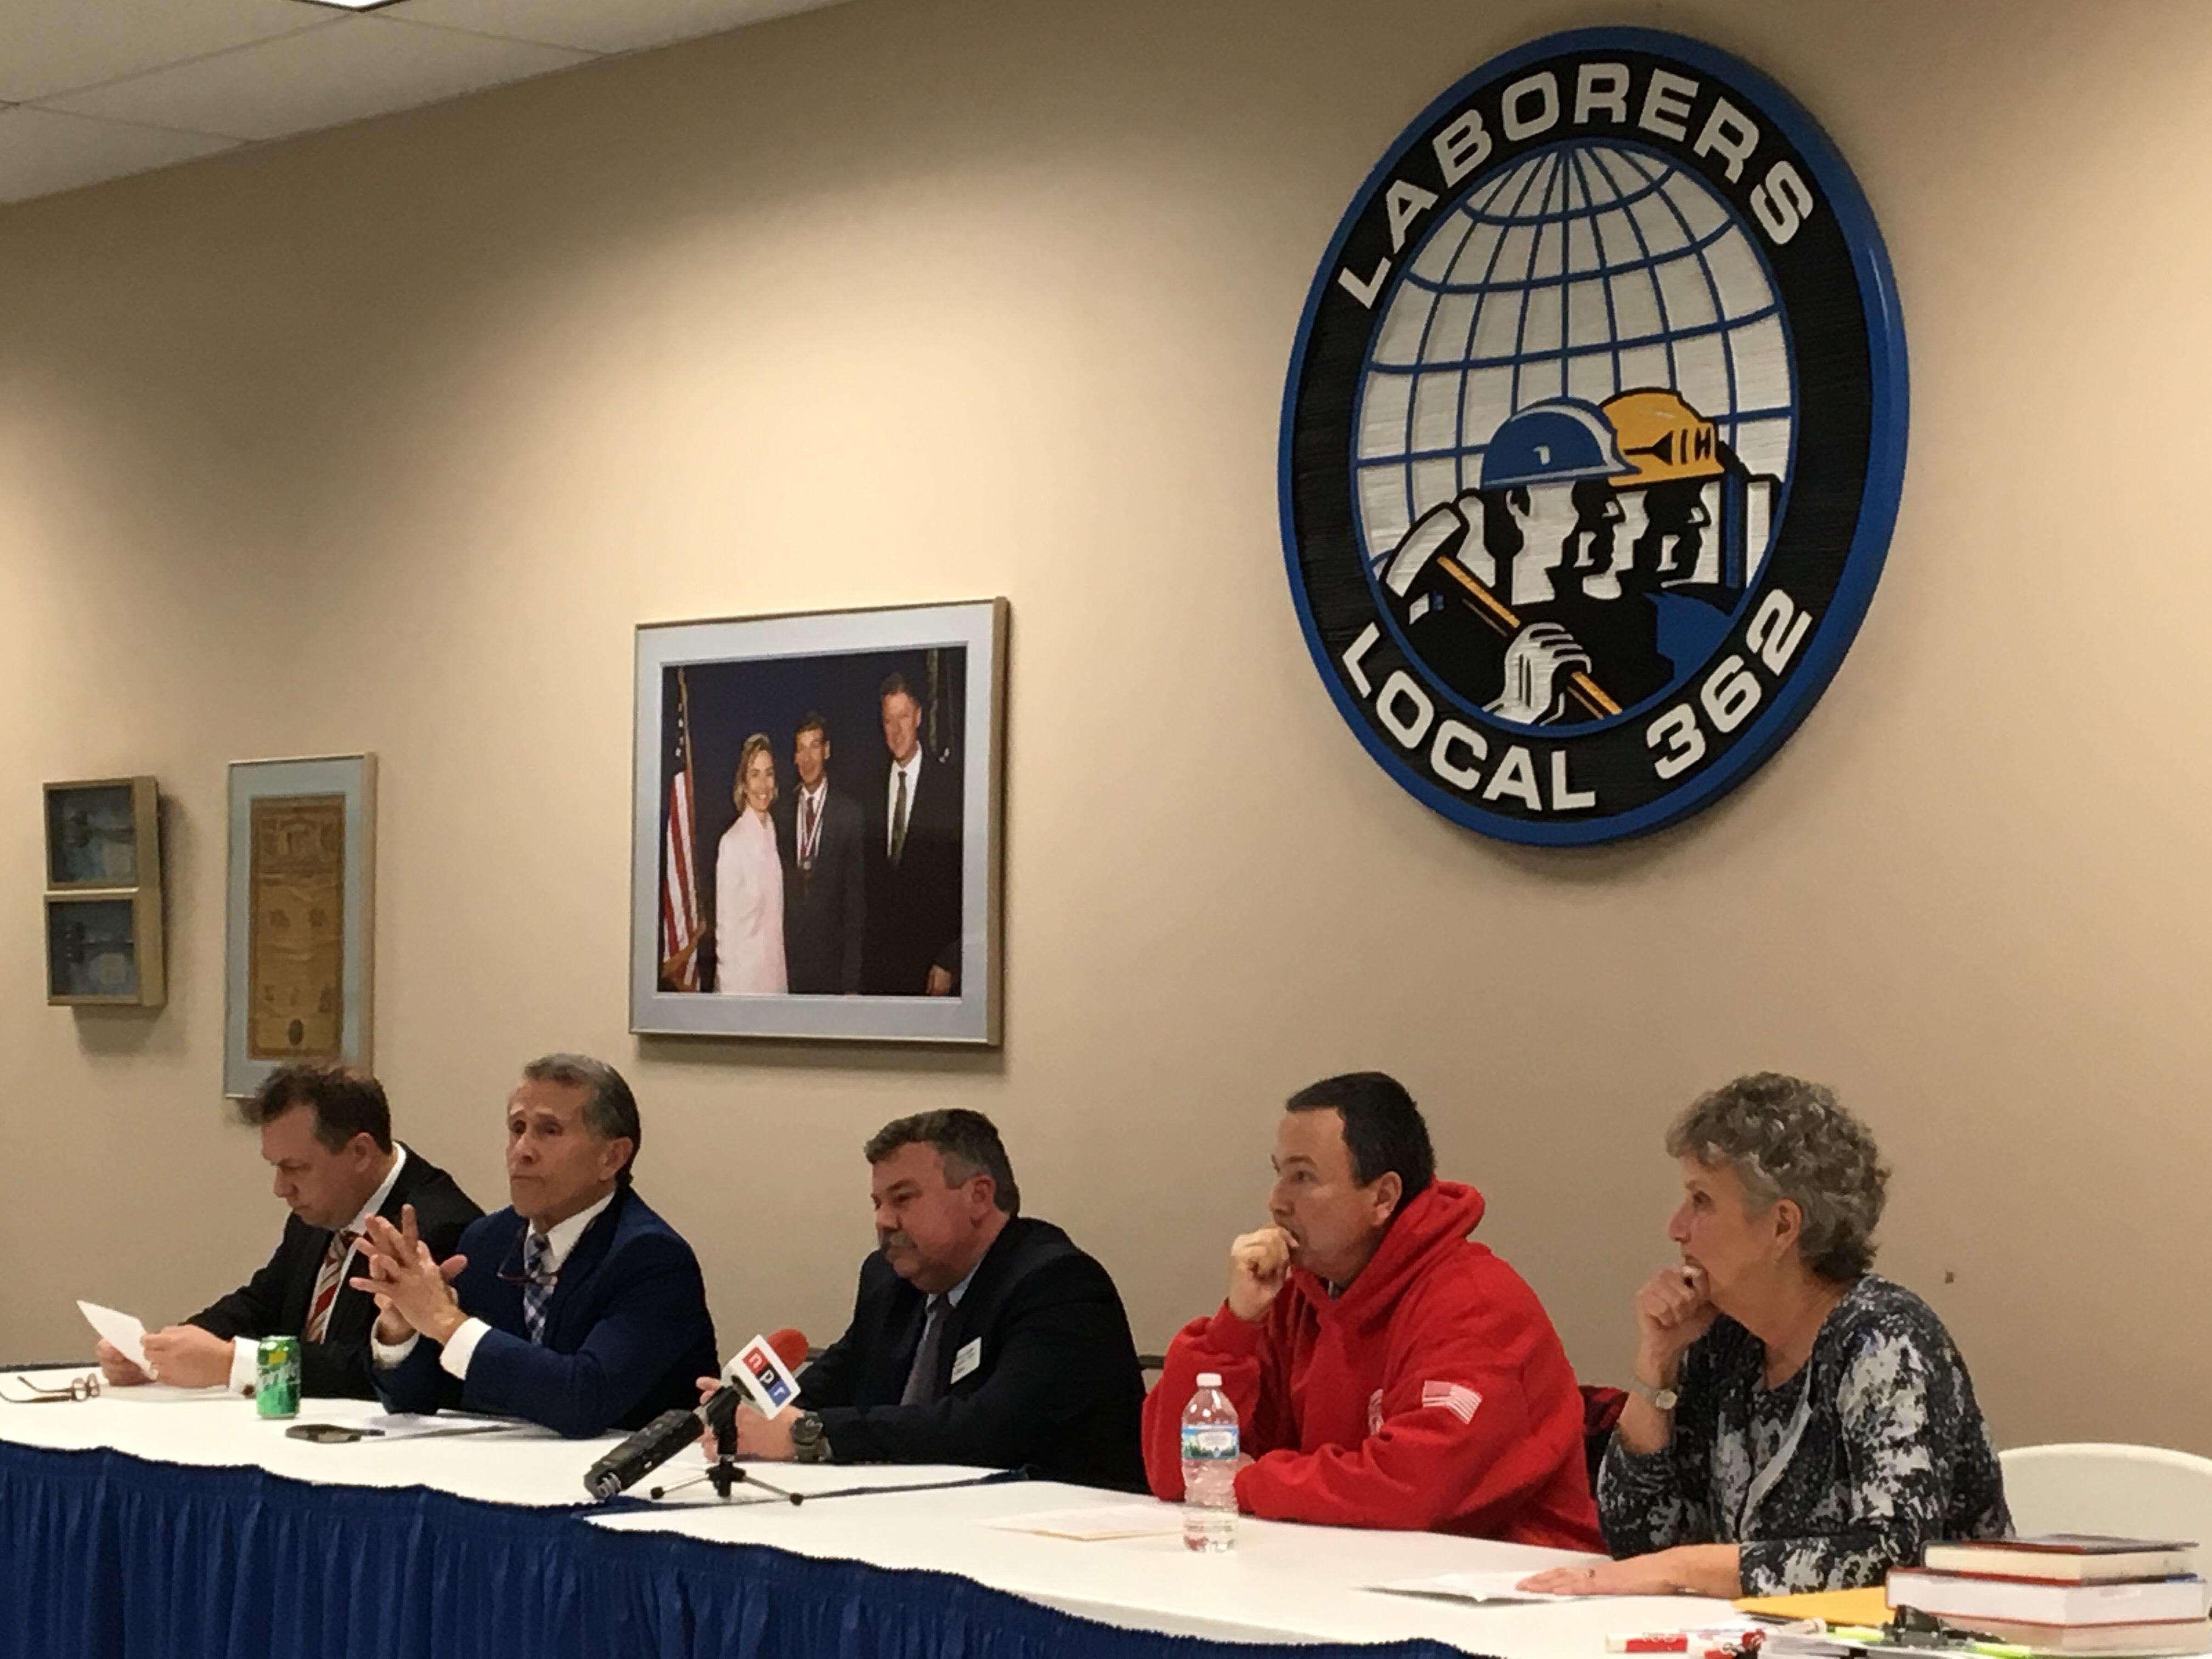 bloomington oral candidates debate city improvement ideas wglt